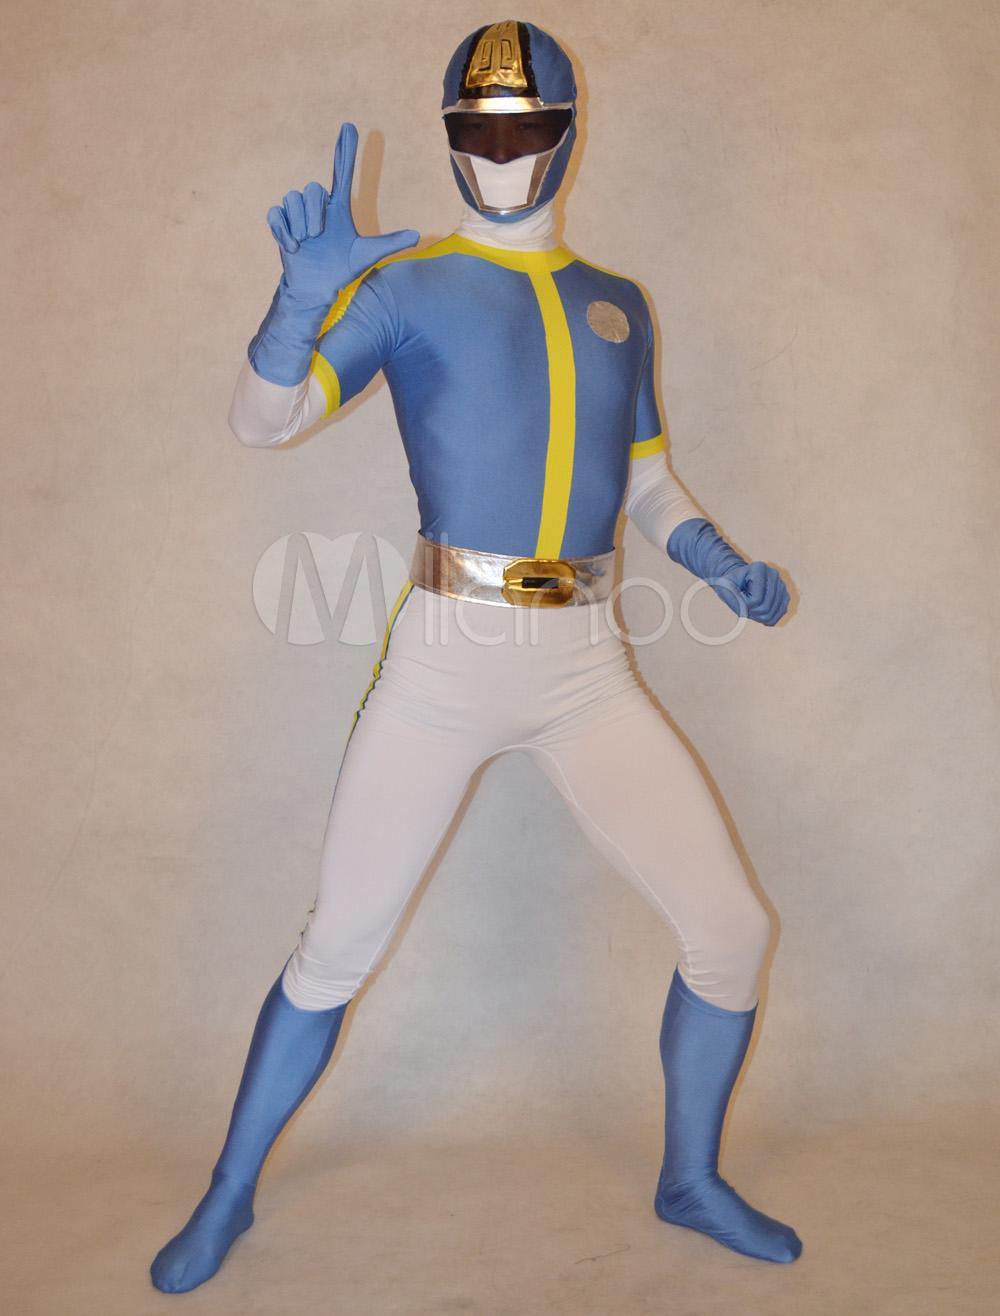 Halloween Handsome Unisex Super Sentai Series Lycra Spandex Cool Multicolor Zentai Suits Halloween